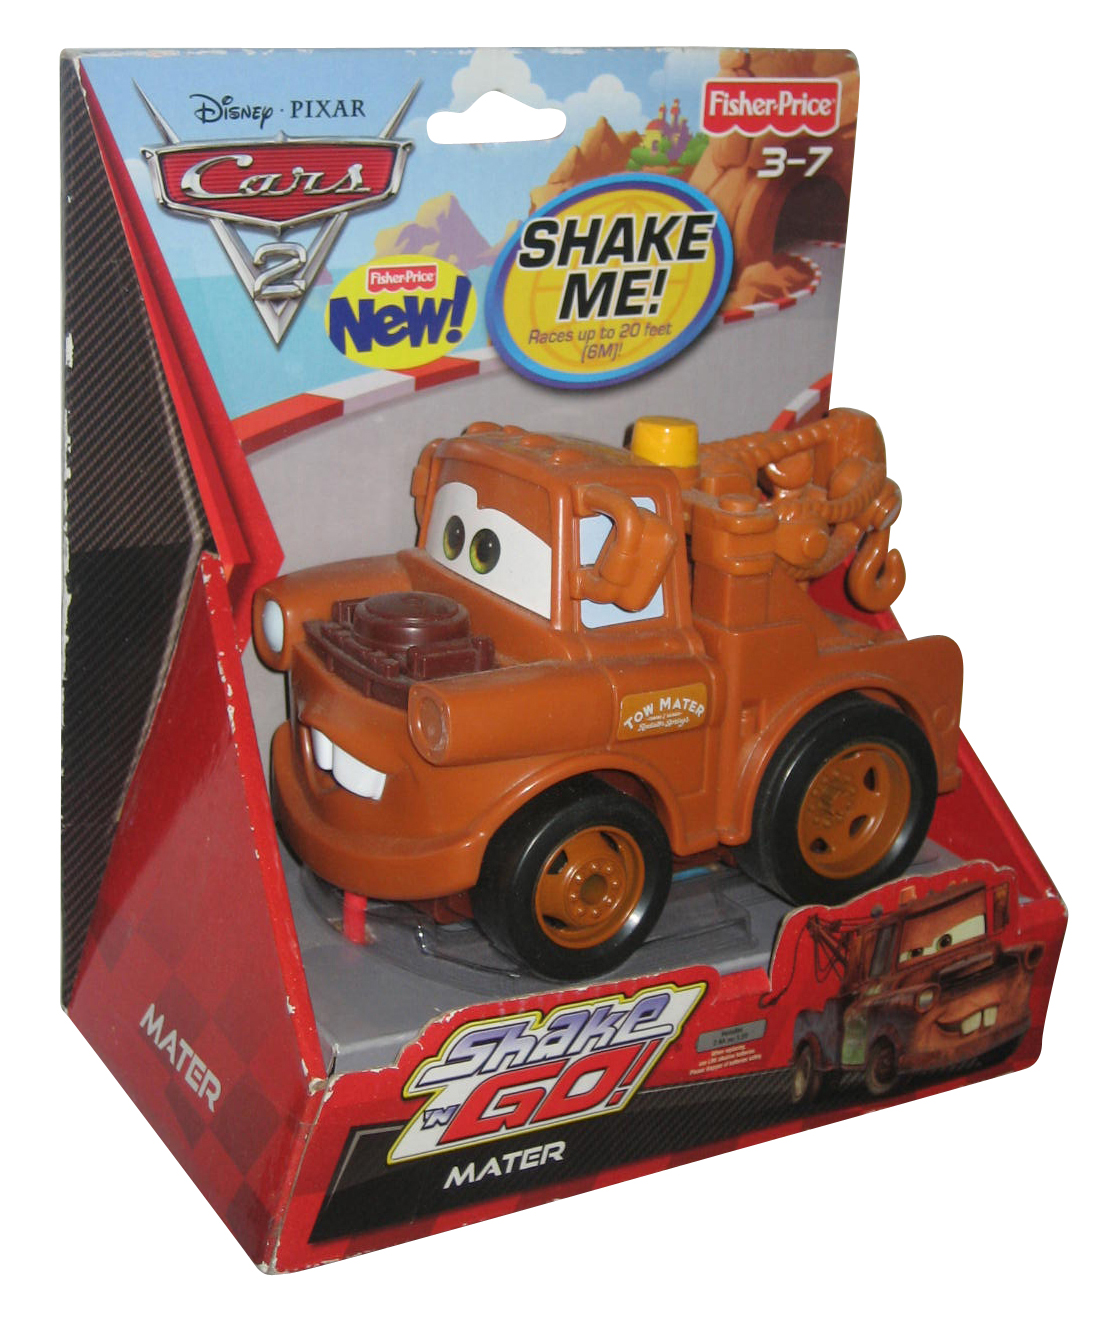 Disney Pixar Movie Cars 2 Fisher Price Shake N Go Mater Vehicle